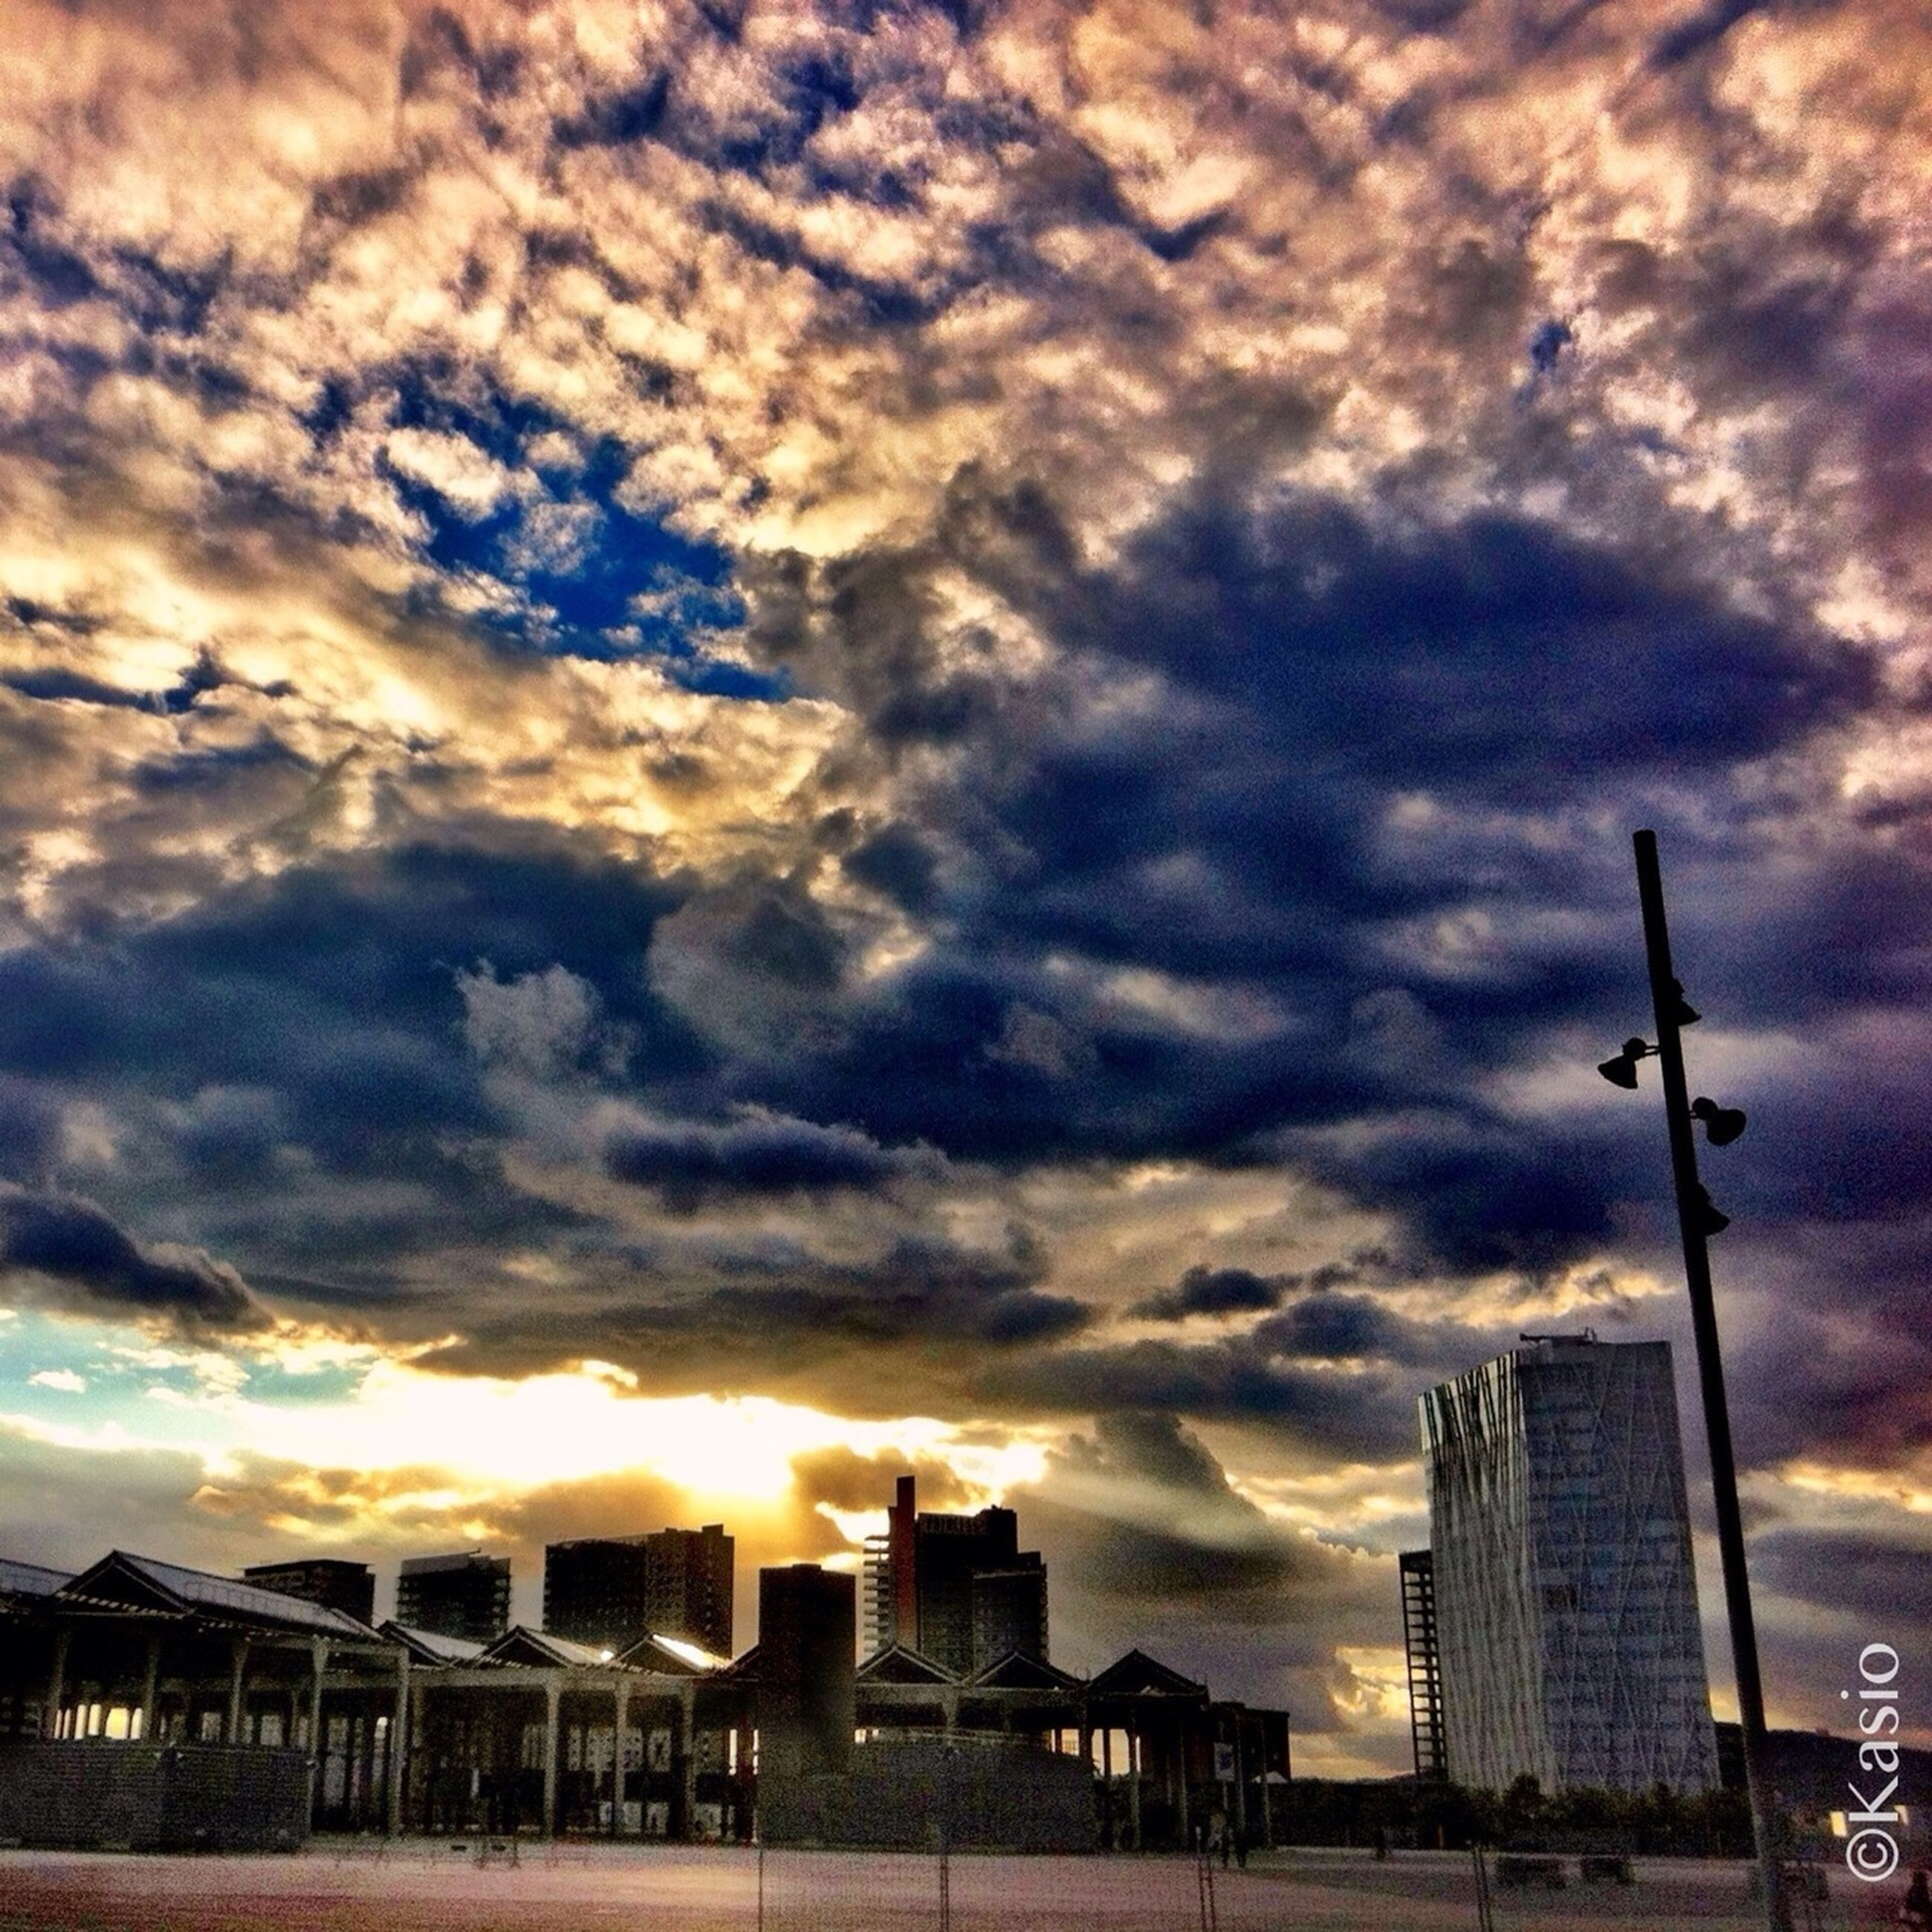 building exterior, architecture, sky, cloud - sky, built structure, sunset, cloudy, city, weather, cloud, cityscape, crane - construction machinery, low angle view, modern, street light, skyscraper, overcast, building, development, silhouette